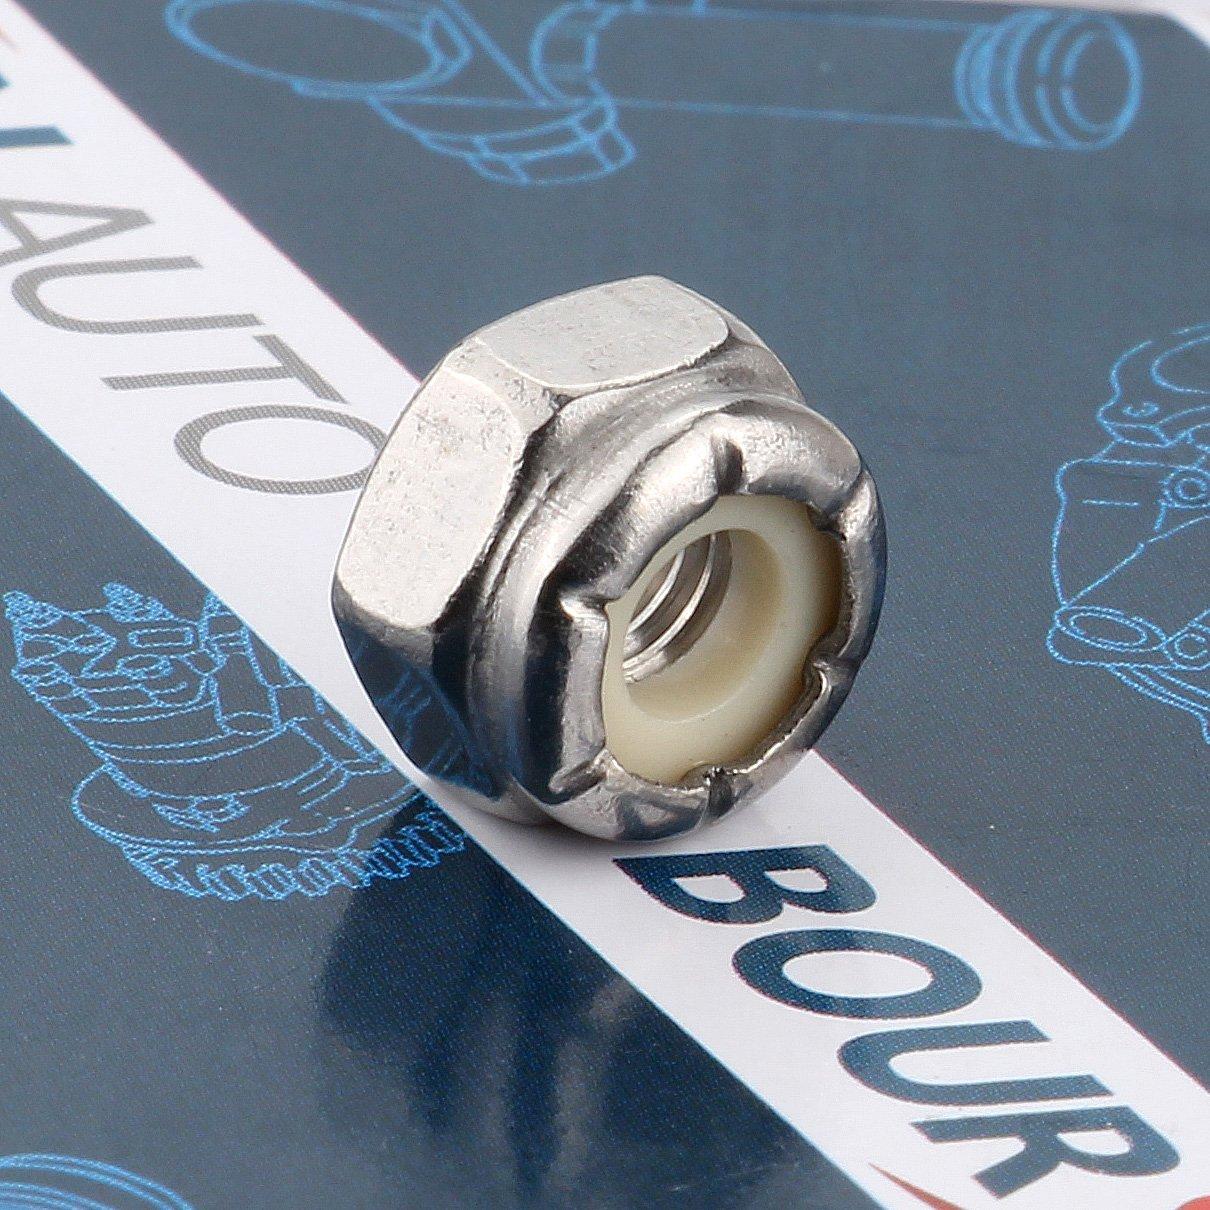 #10-32 Inch Nylon Insert Hex Lock Nuts 18-8 304 Stainless Steel 120 Pieces Boursin Hardware.Ltd